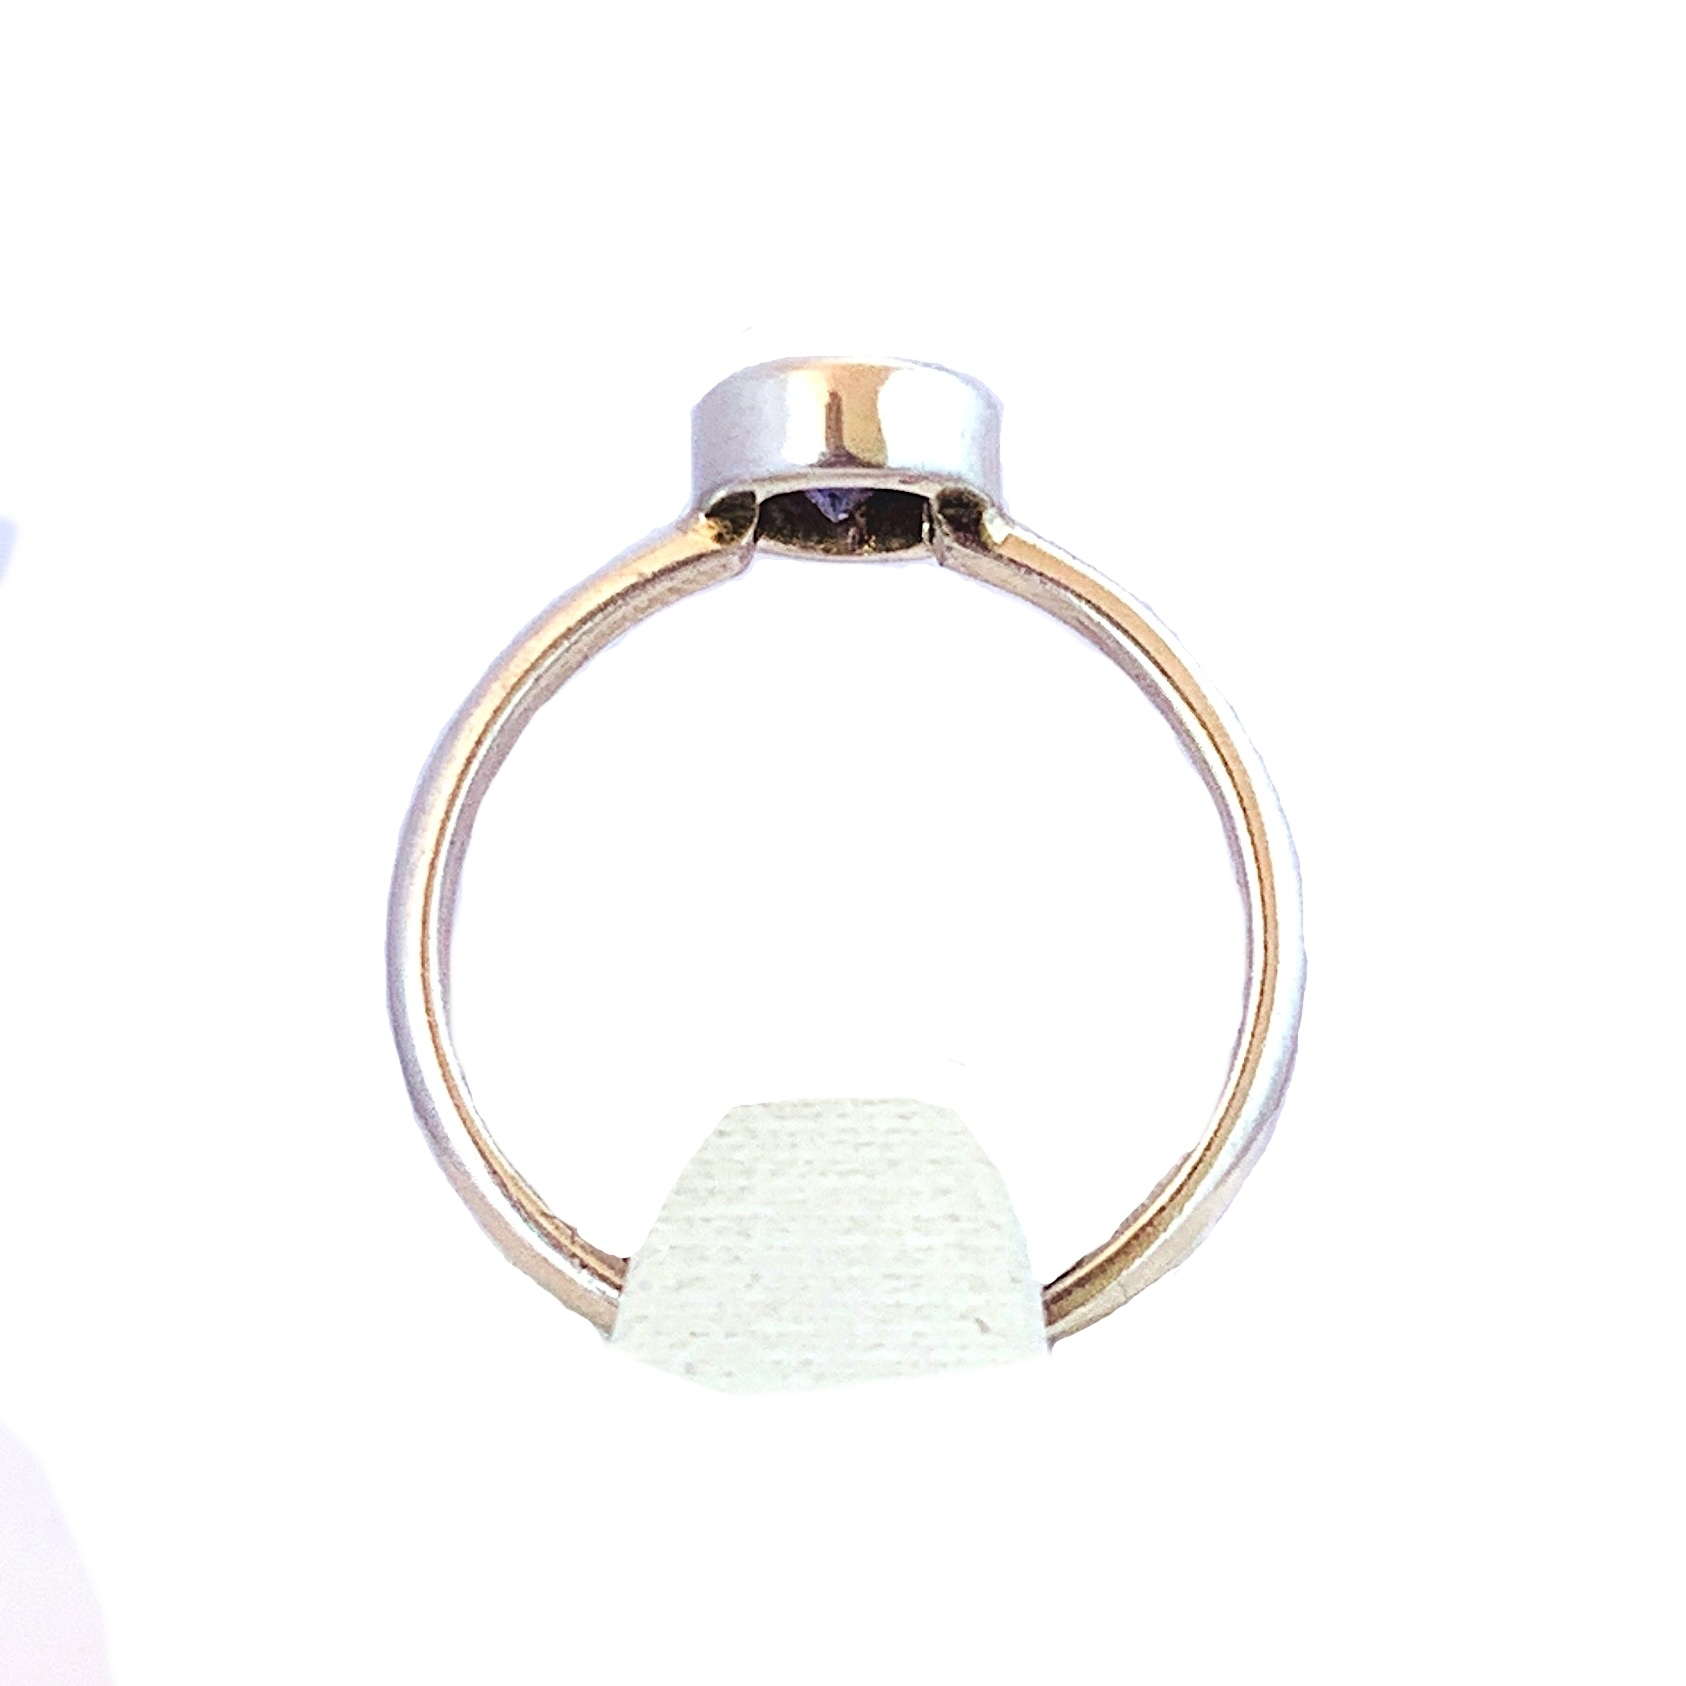 Kiliaan collectie Tanzaniet ring